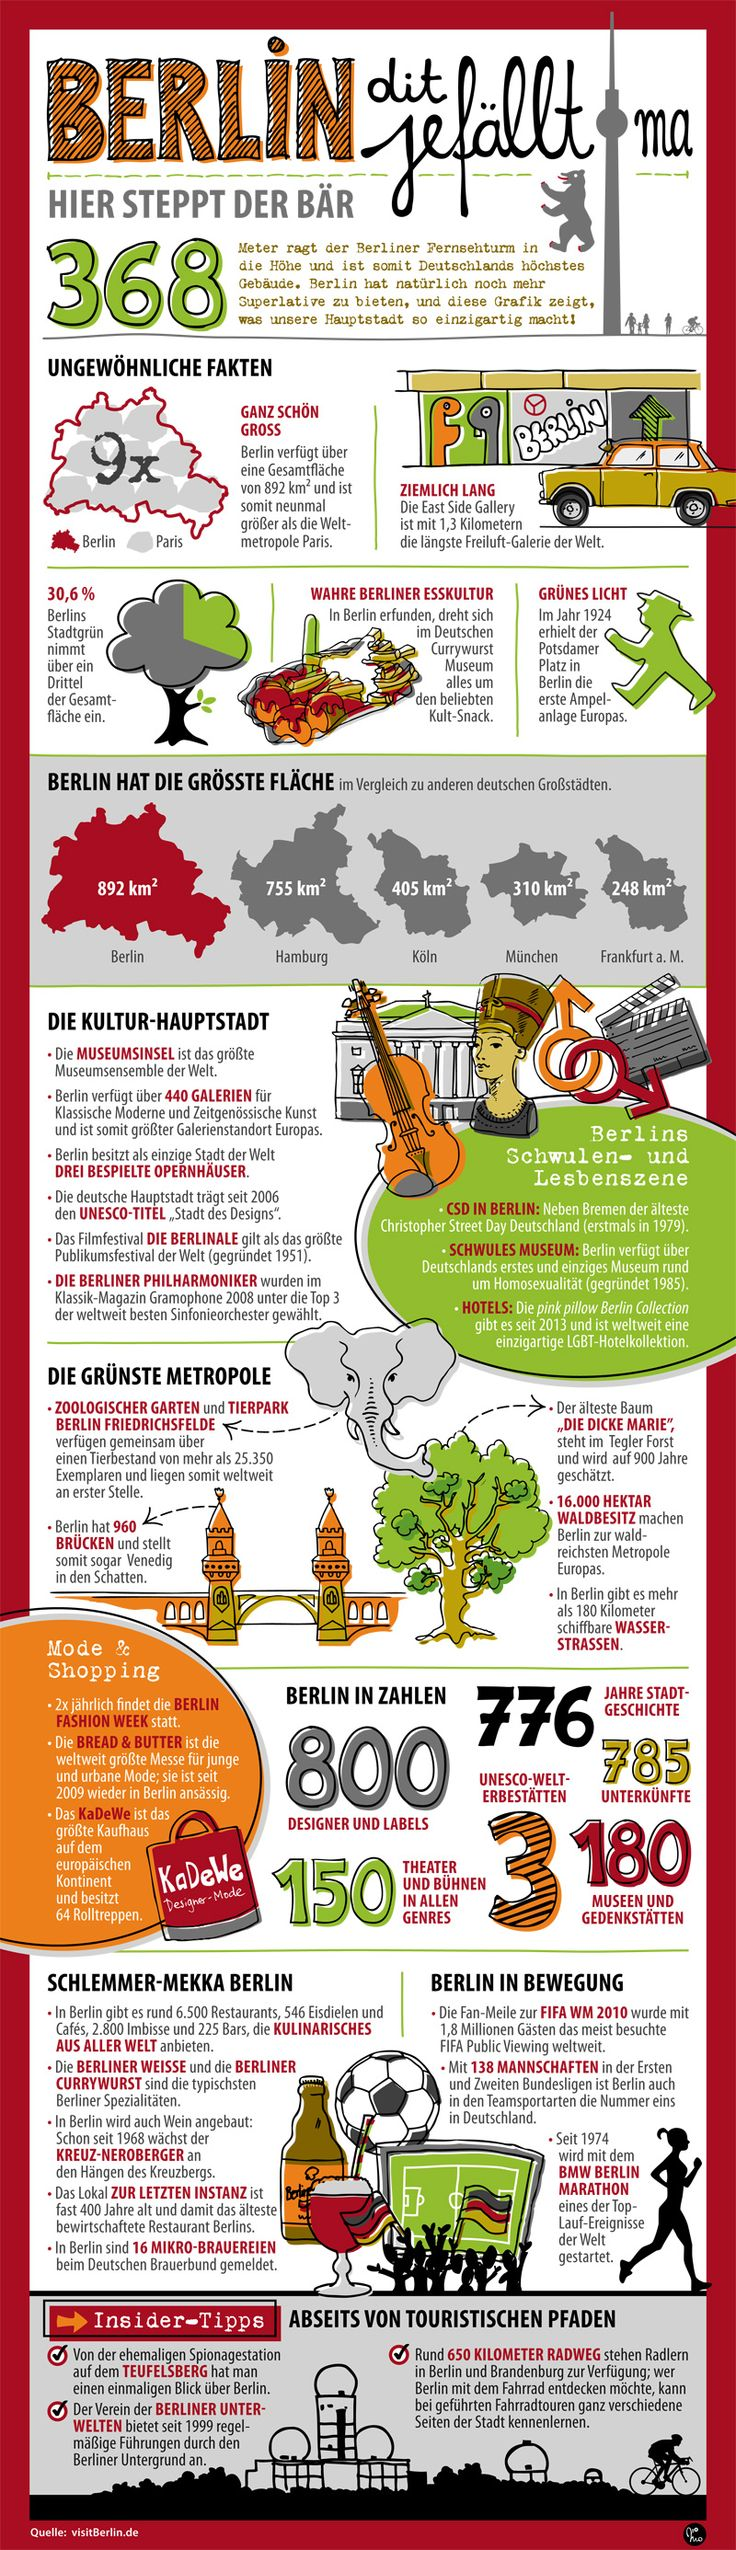 Infografik: Berlin